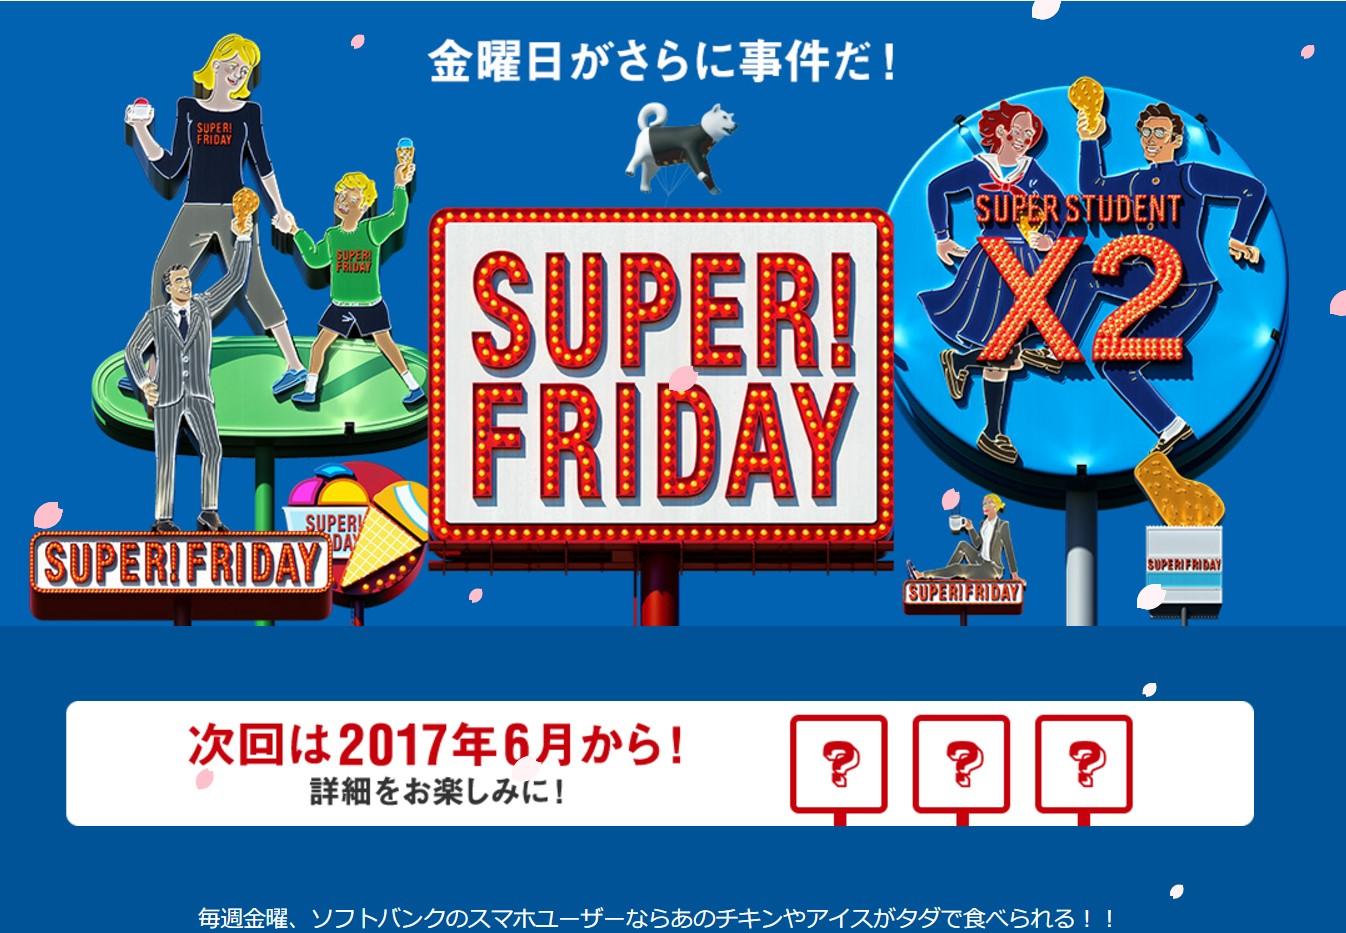 Engadget Japanese日本版ソフトバンクSUPER FRIDAYは6月に再開、ただし5月は休止に。店舗や特典は後日発表